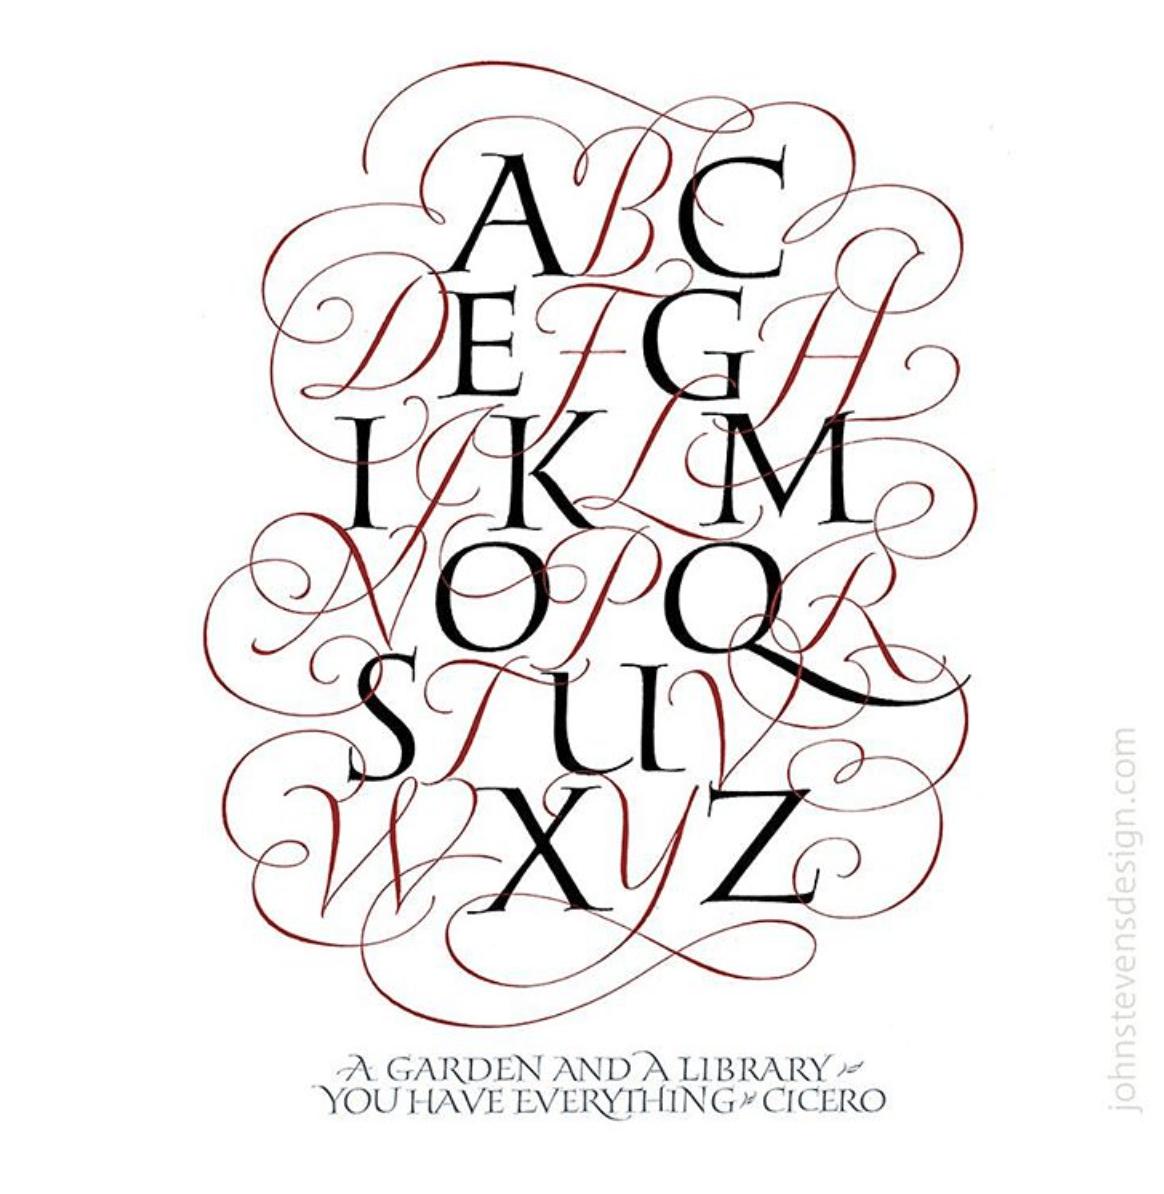 John Stevens Roman and Calligraphy Style Alphabet - Lettering Tutorial